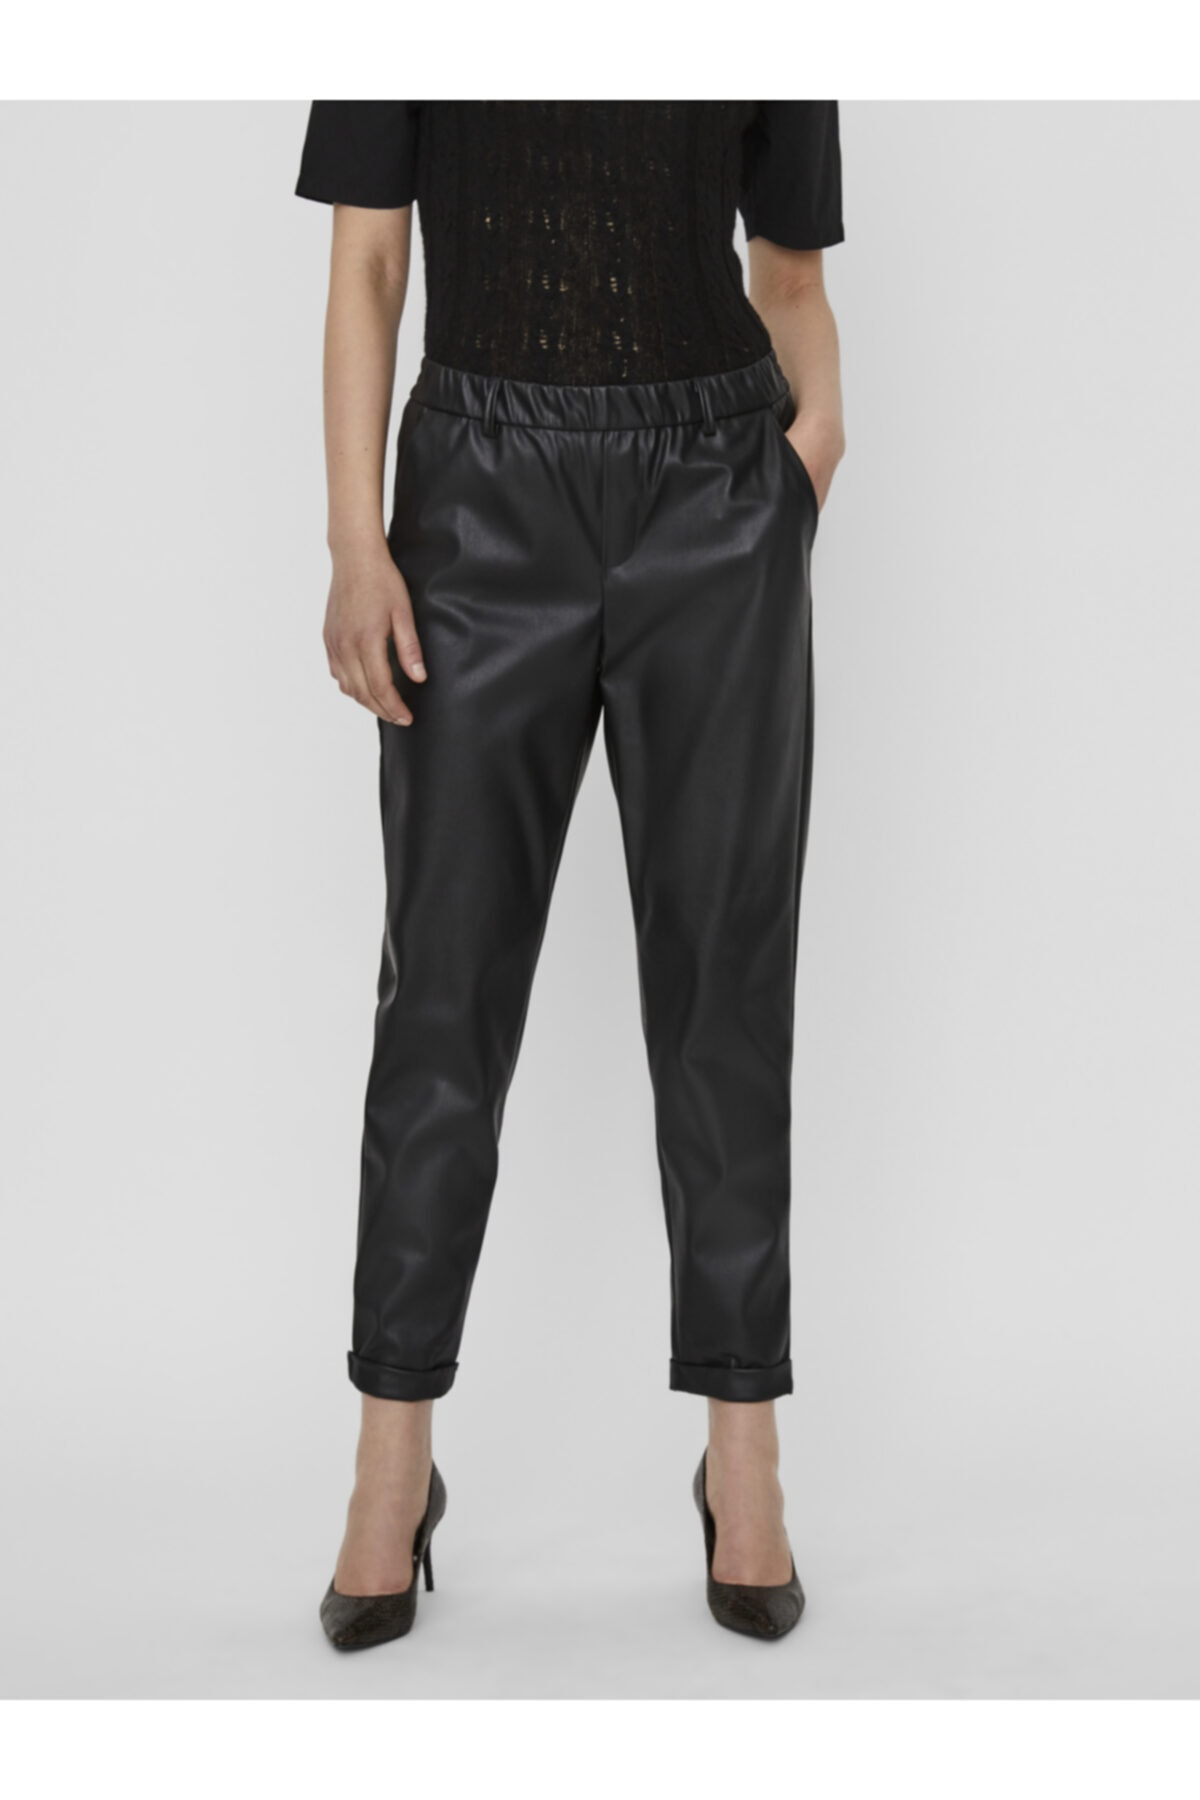 Vero Moda Kadın Siyah Beli Lastikli Deri Pantolon 10237236 VMMAYA 2